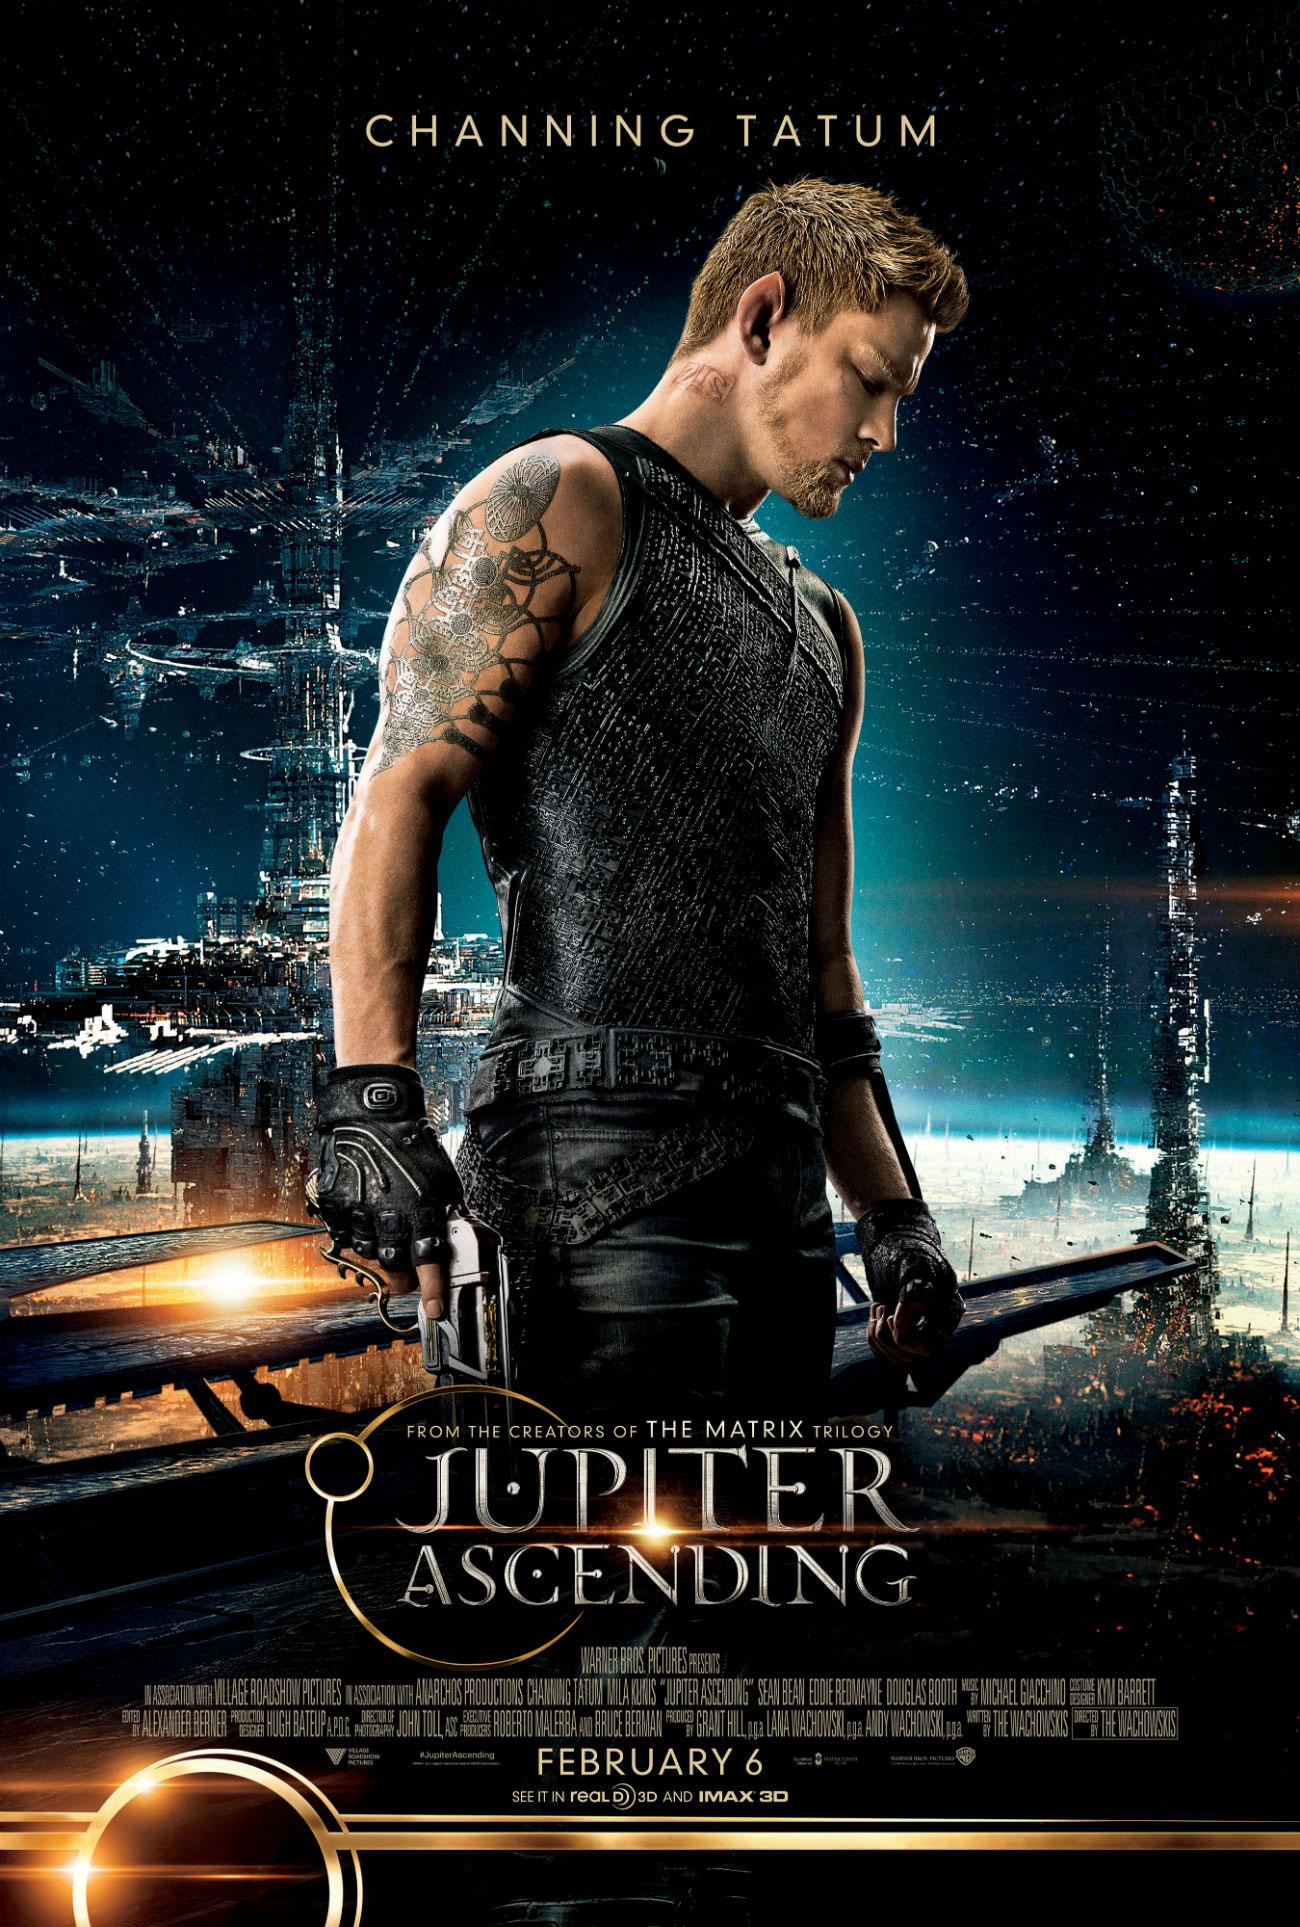 See 'Jupiter Ascending' Posters Featuring Channing Tatum, Eddie Redmayne + More